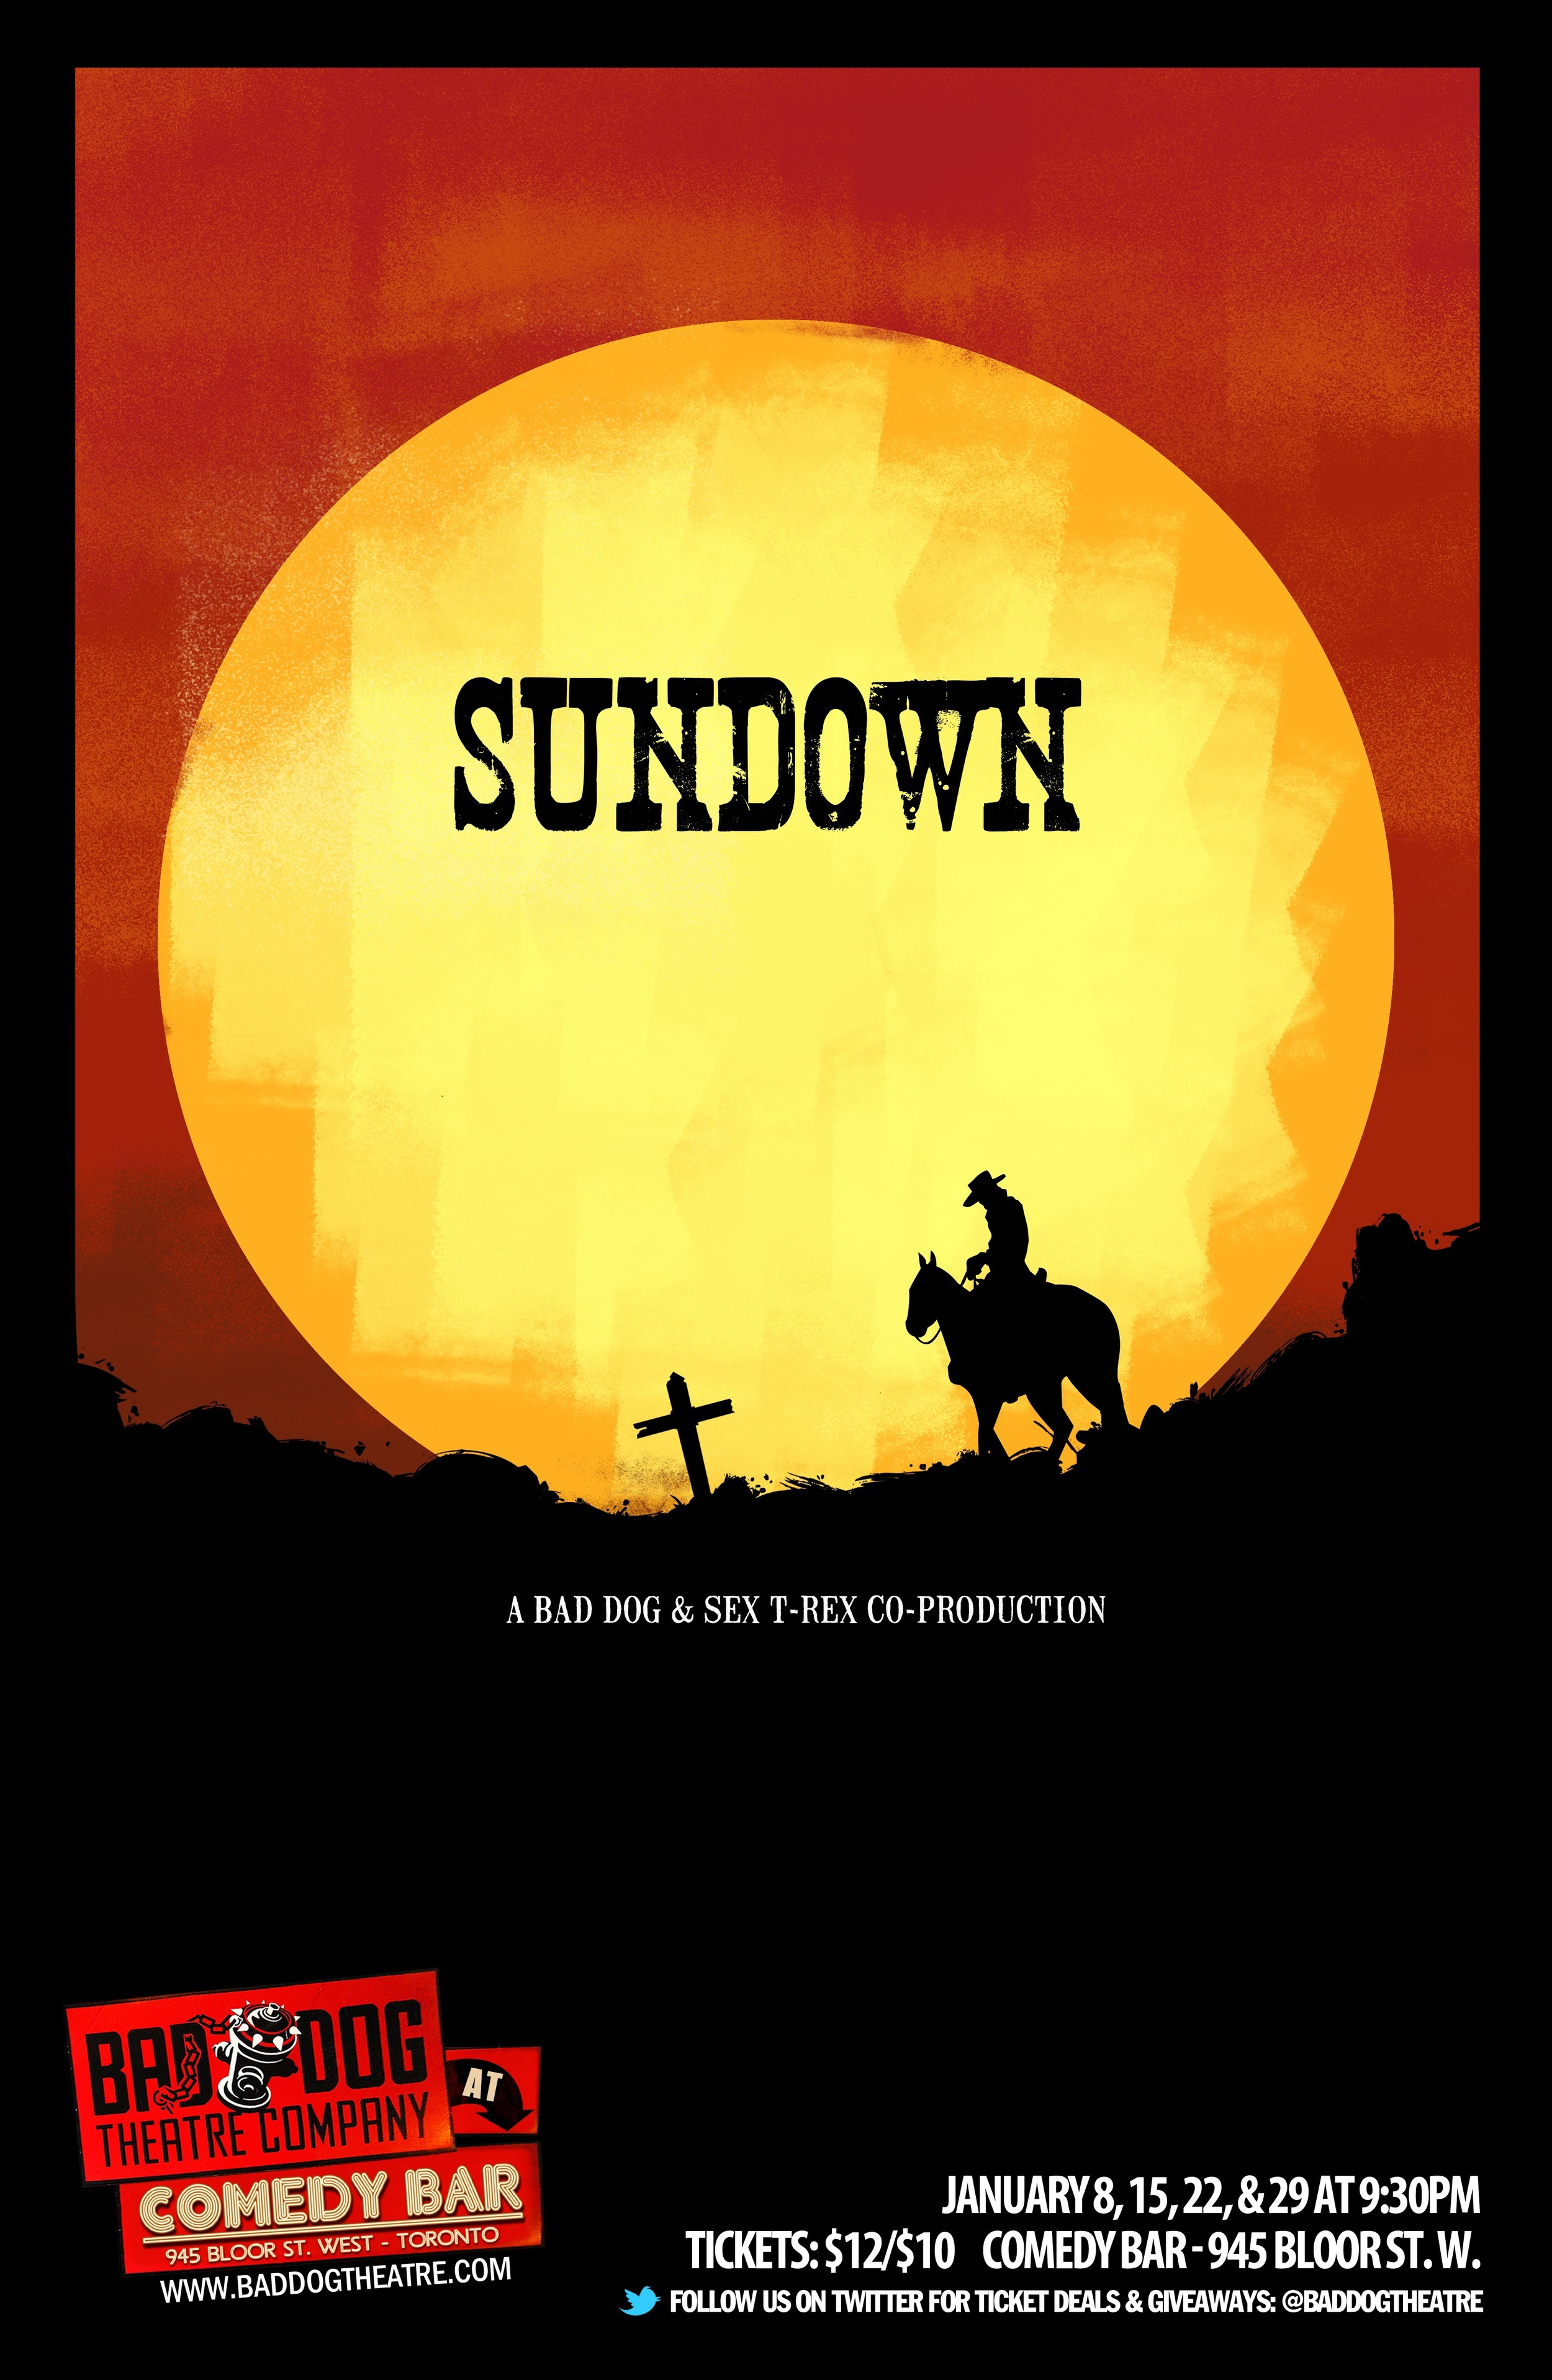 See Sundown Wednesdays in January